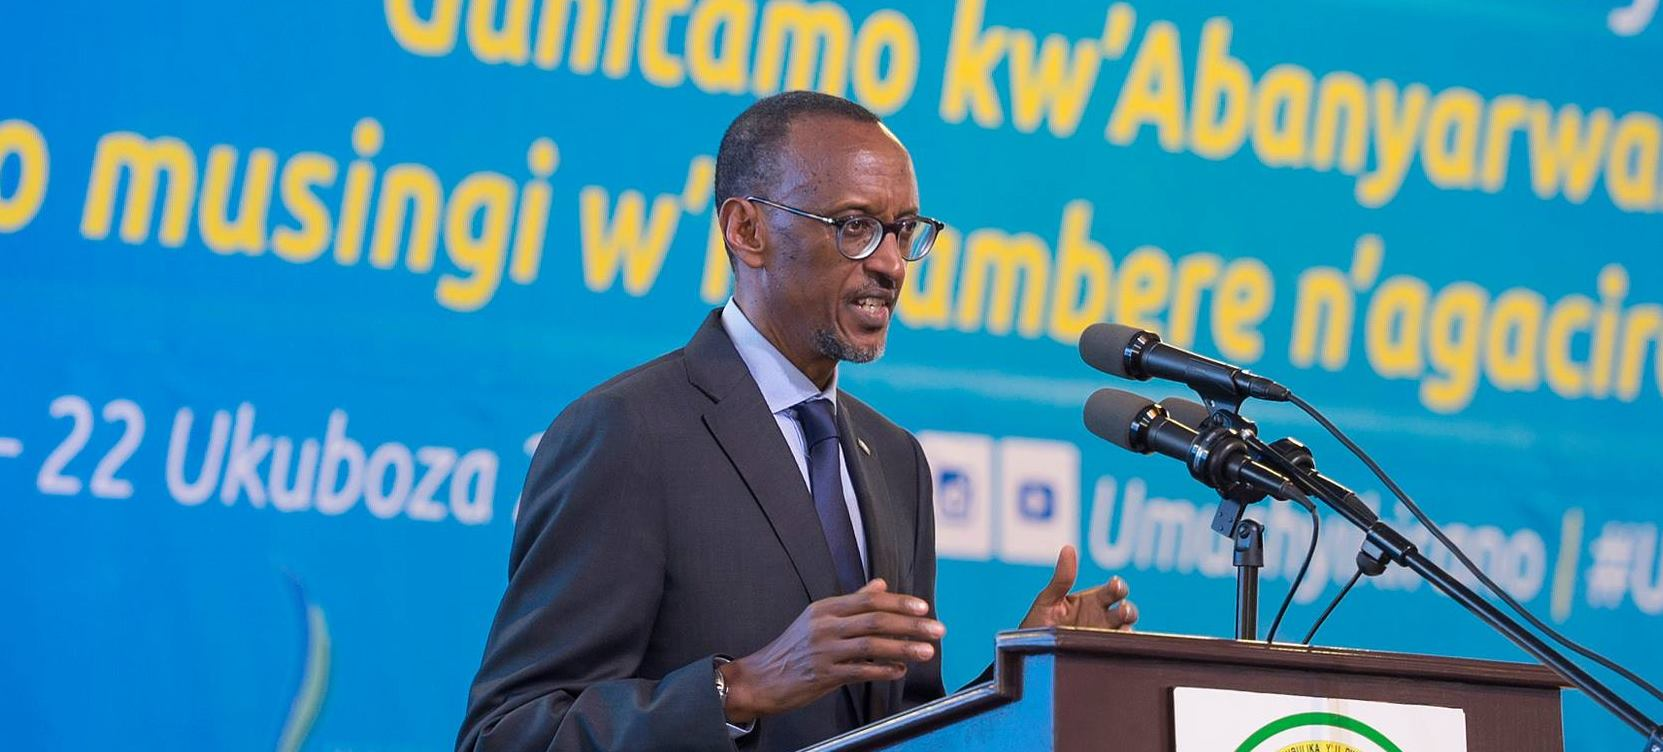 VIDEO: Paul Kagame zahvalio narodu Ruande na odlučnosti